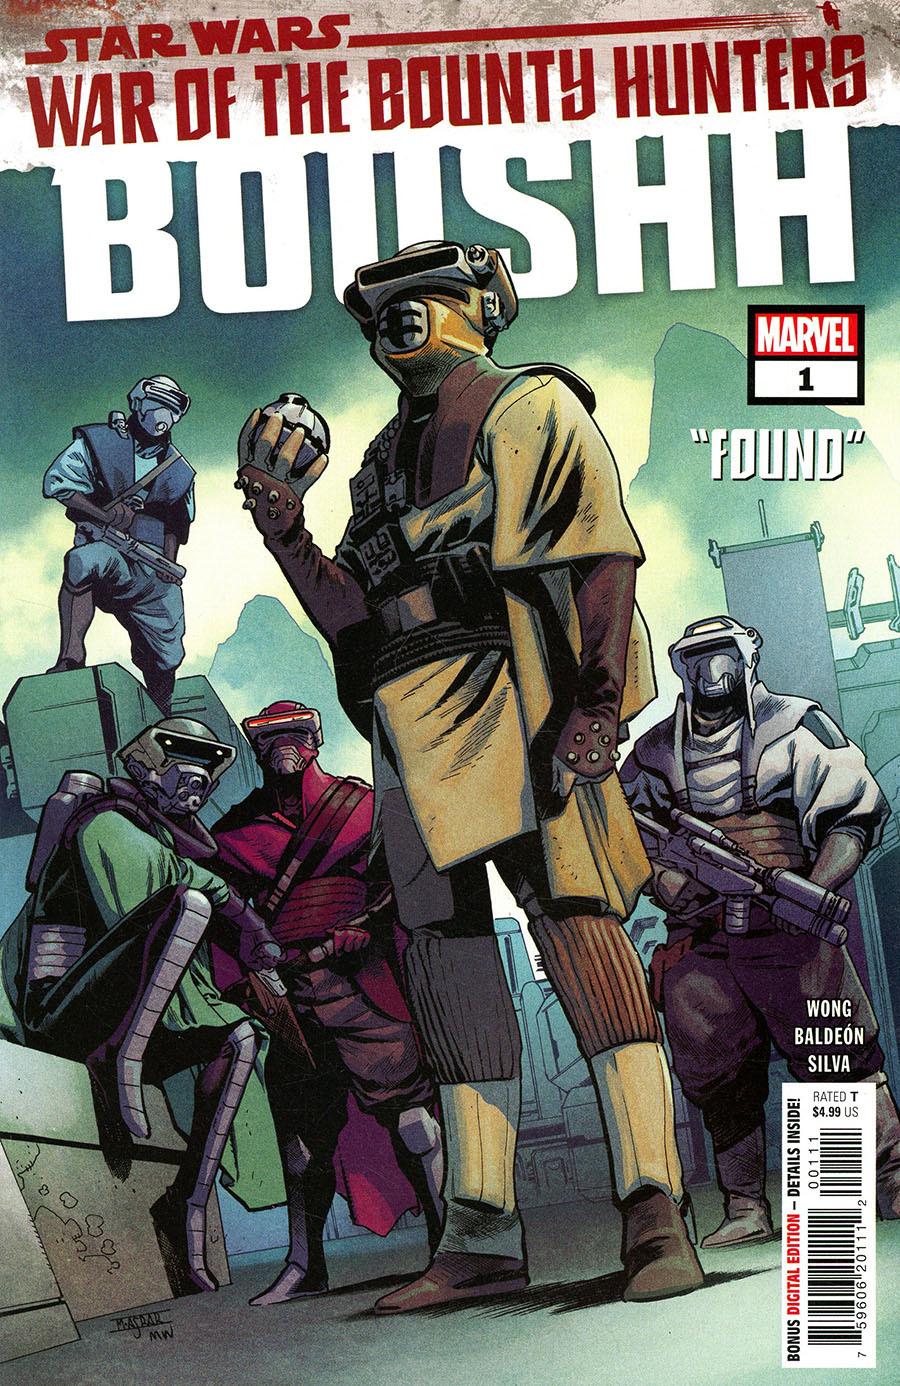 Star Wars: War of the Bounty Hunters: Boushh